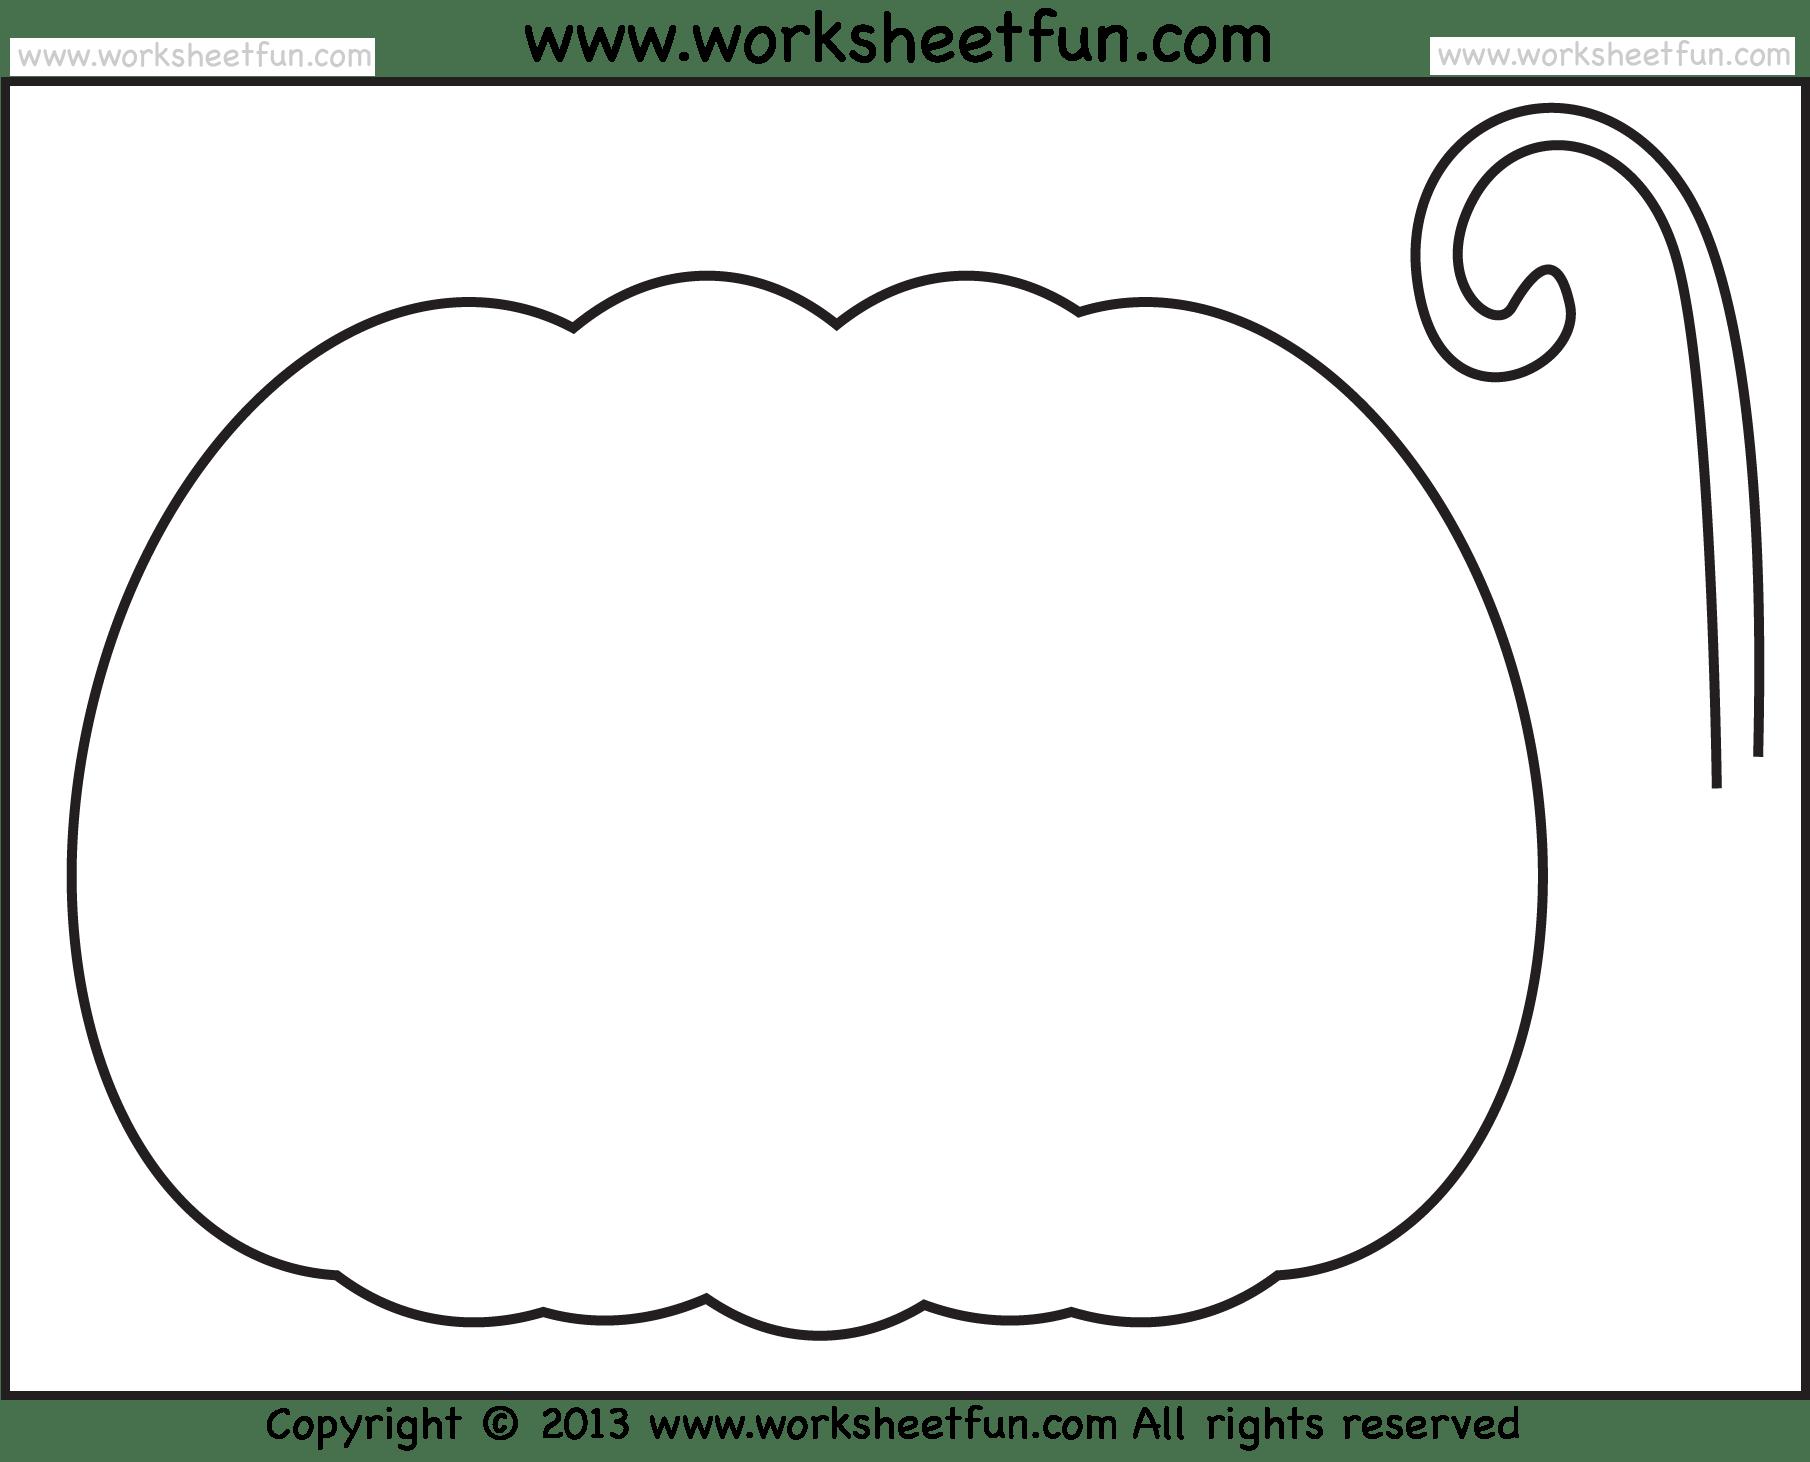 Worksheet Fun Halloween